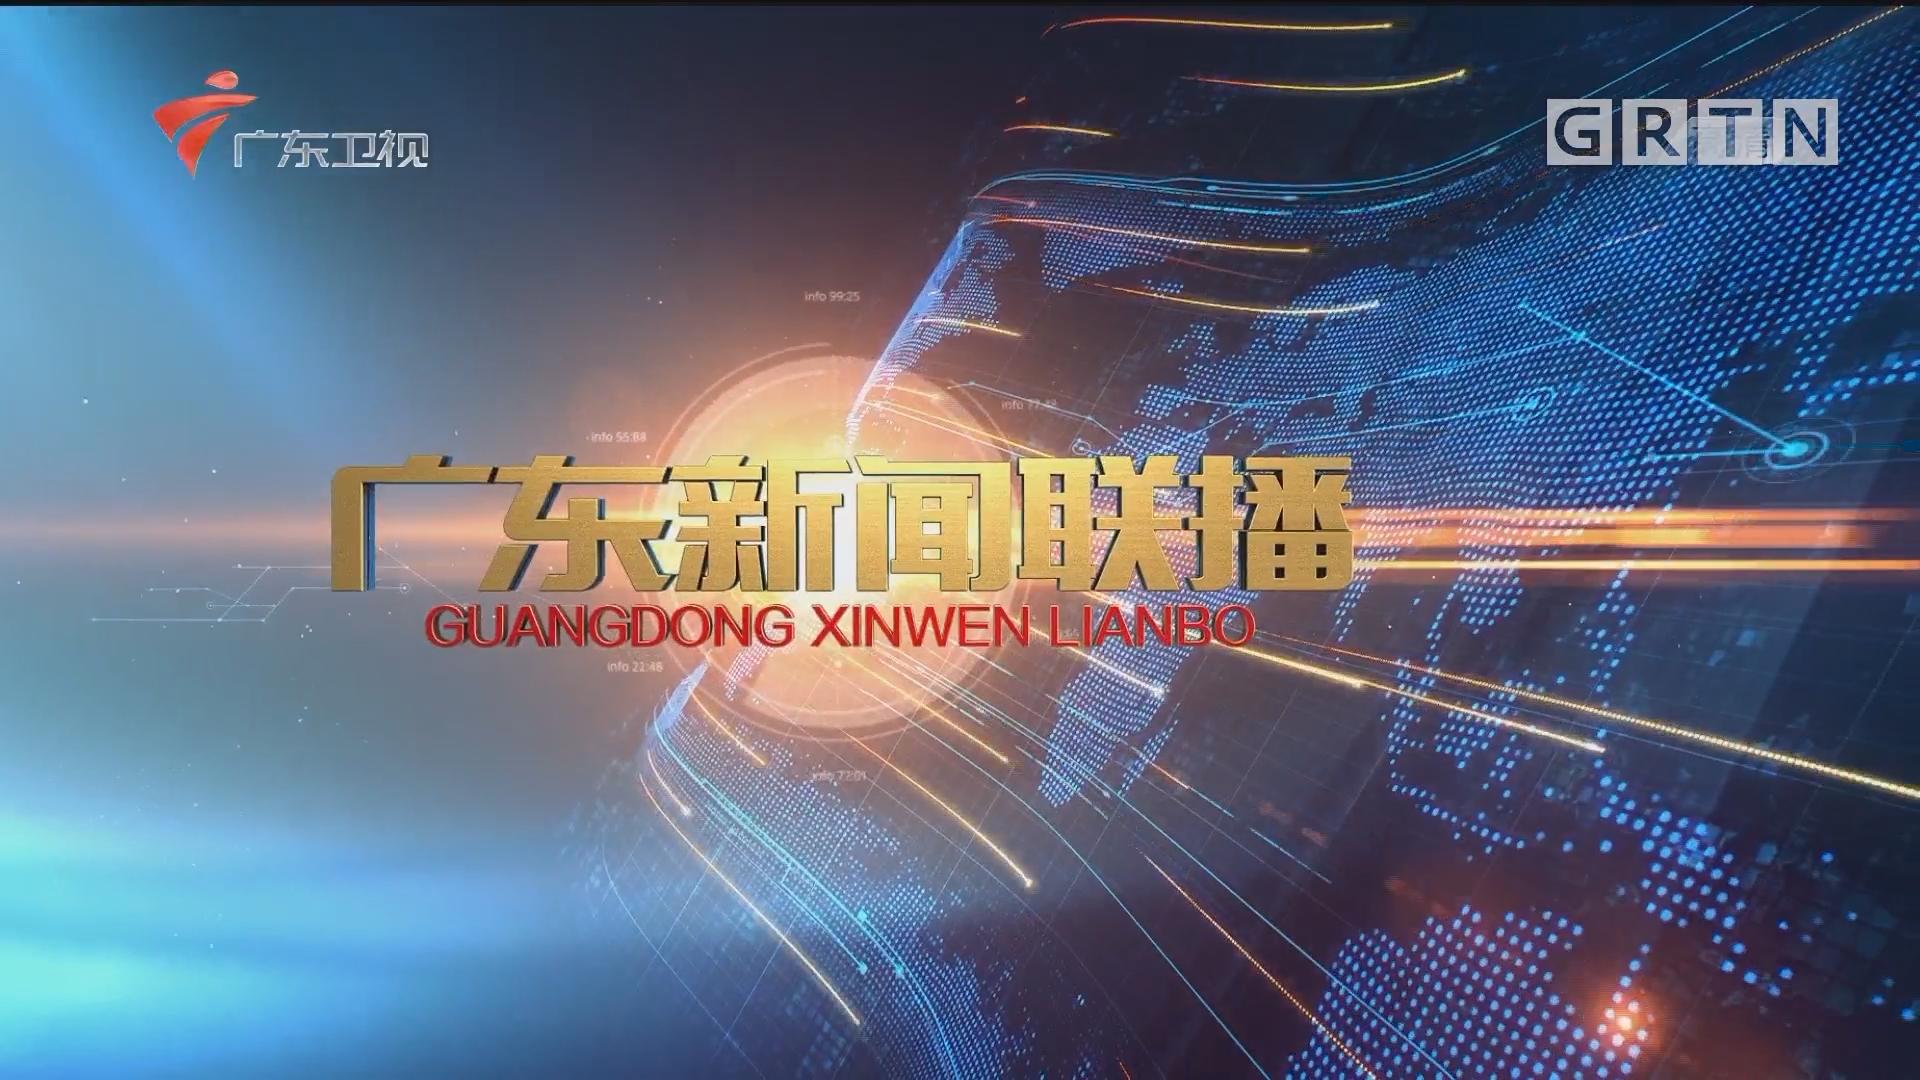 [HD][2017-11-08]广东新闻联播:推进绿色发展 建设美丽广东